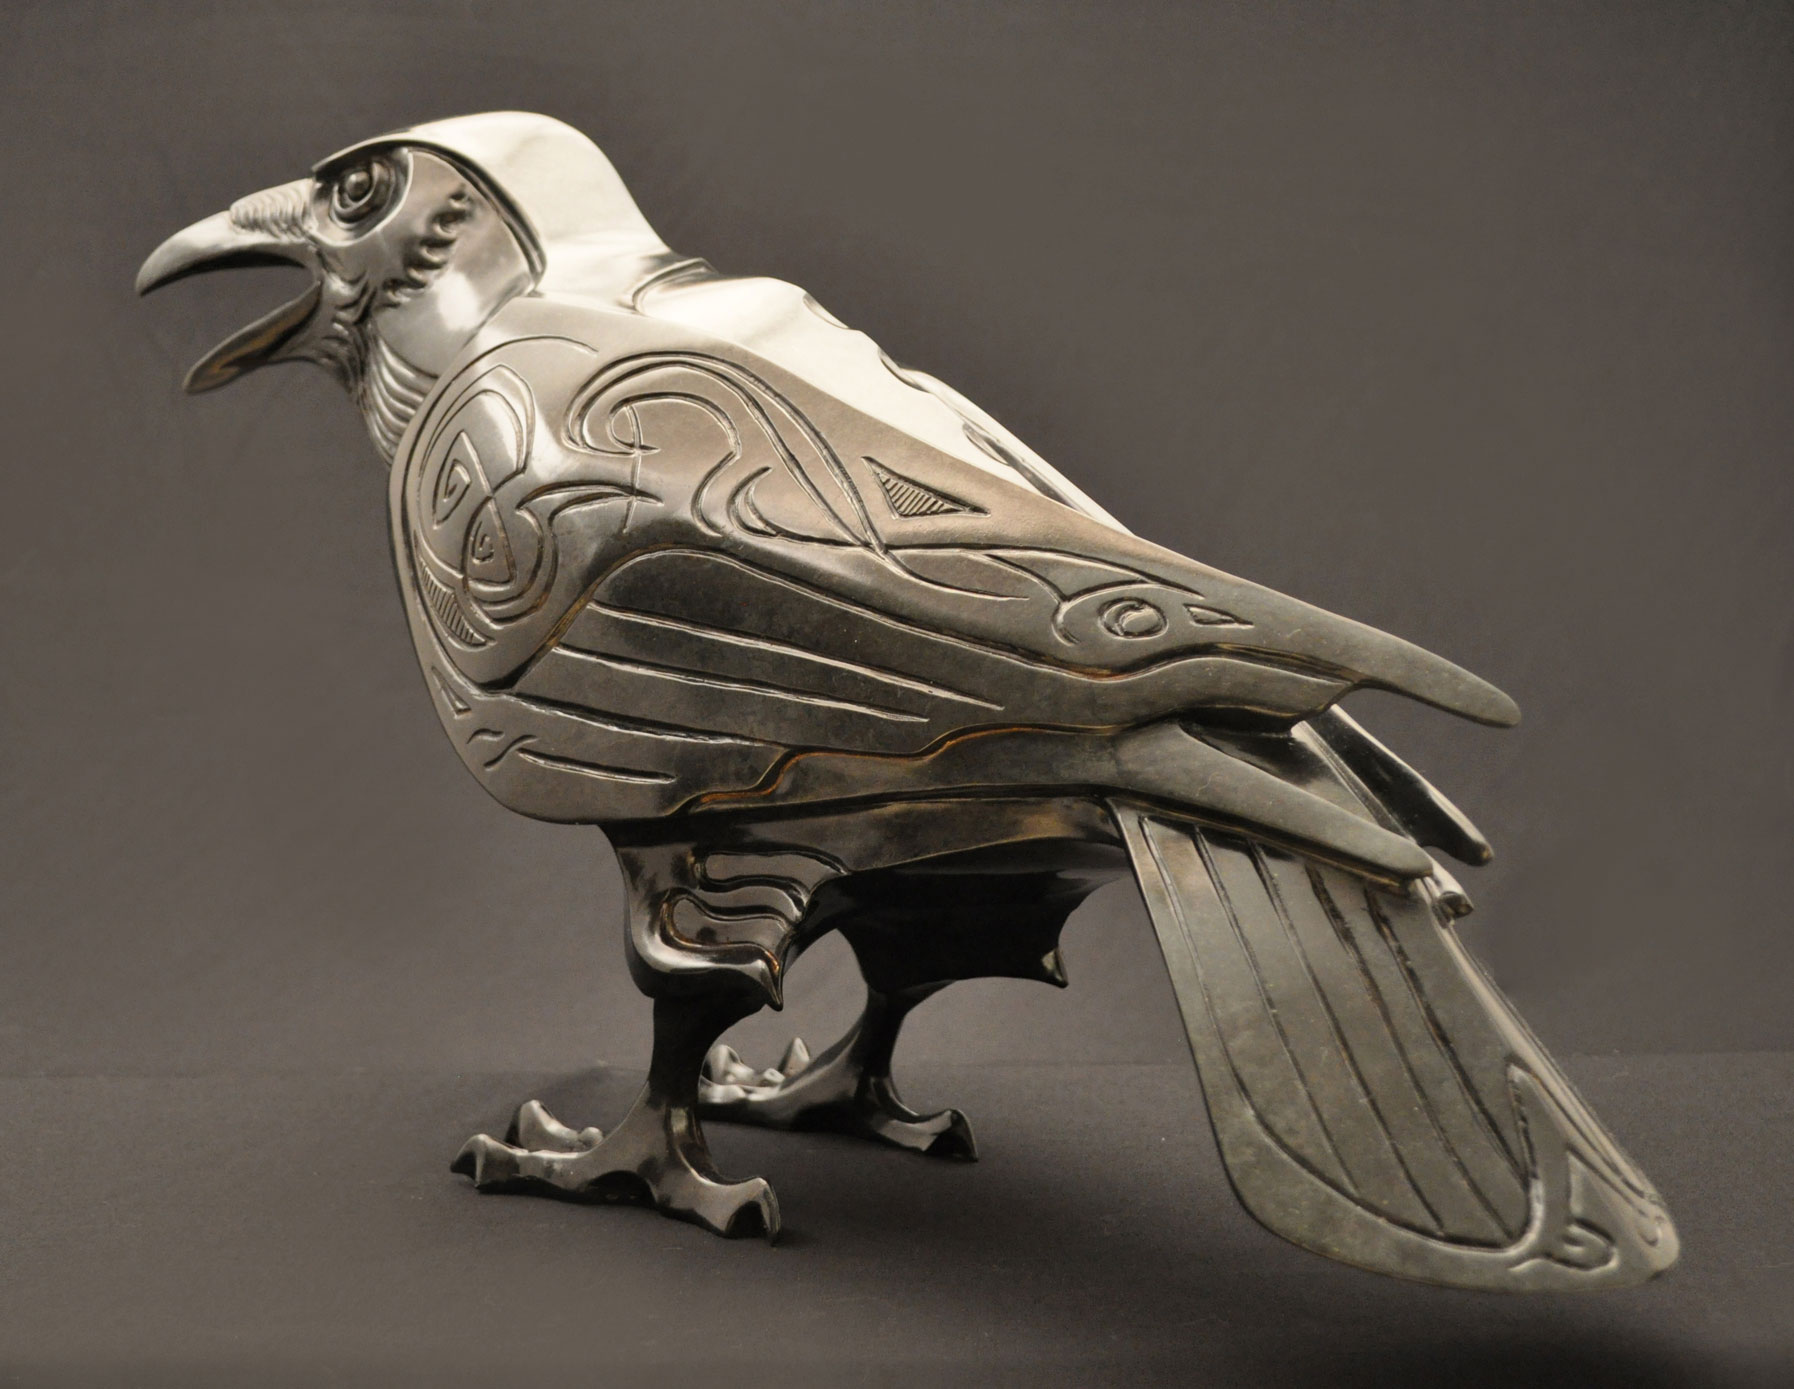 Raven-Sculpture-Bronze-John-Maisano---2.jpg